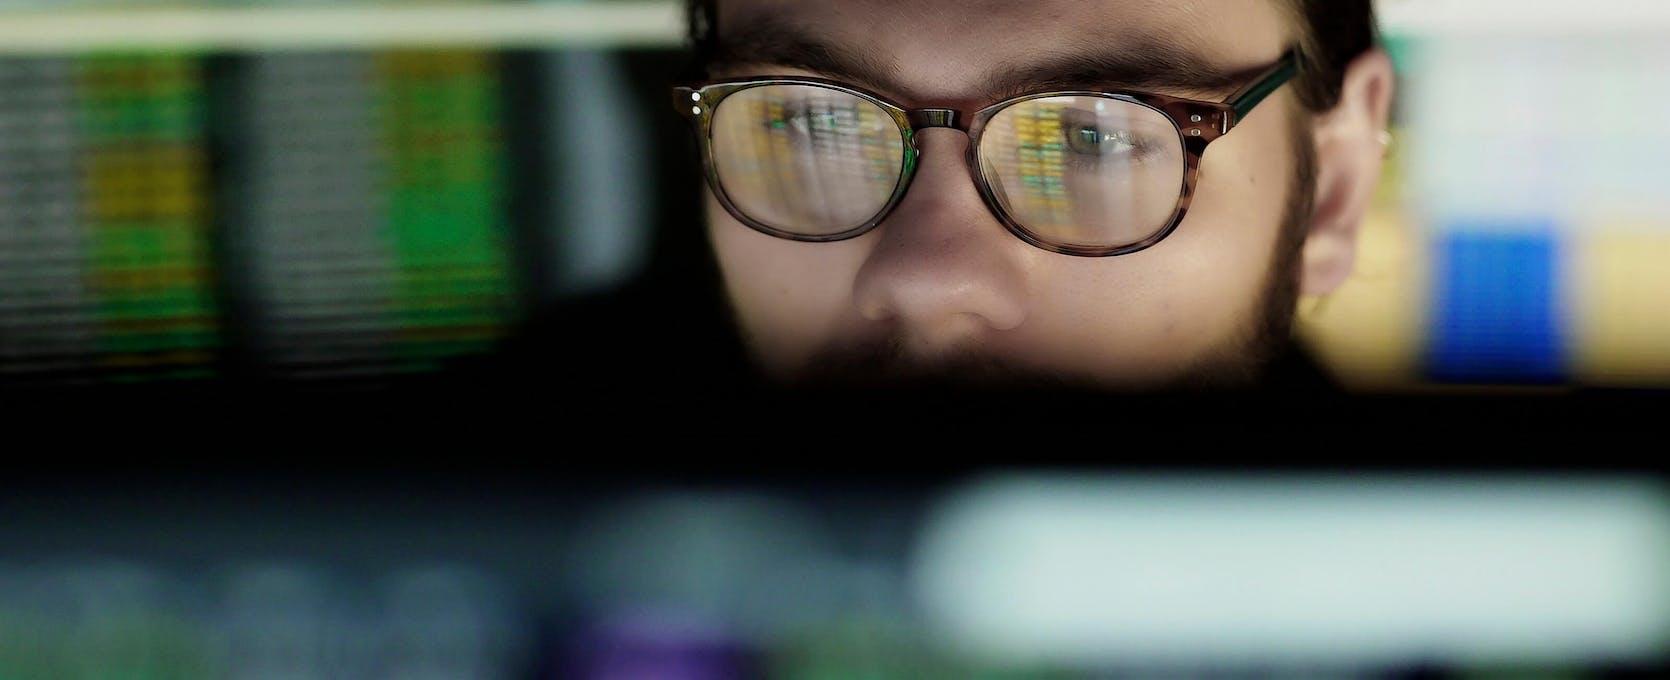 Man analyzes data on the computer